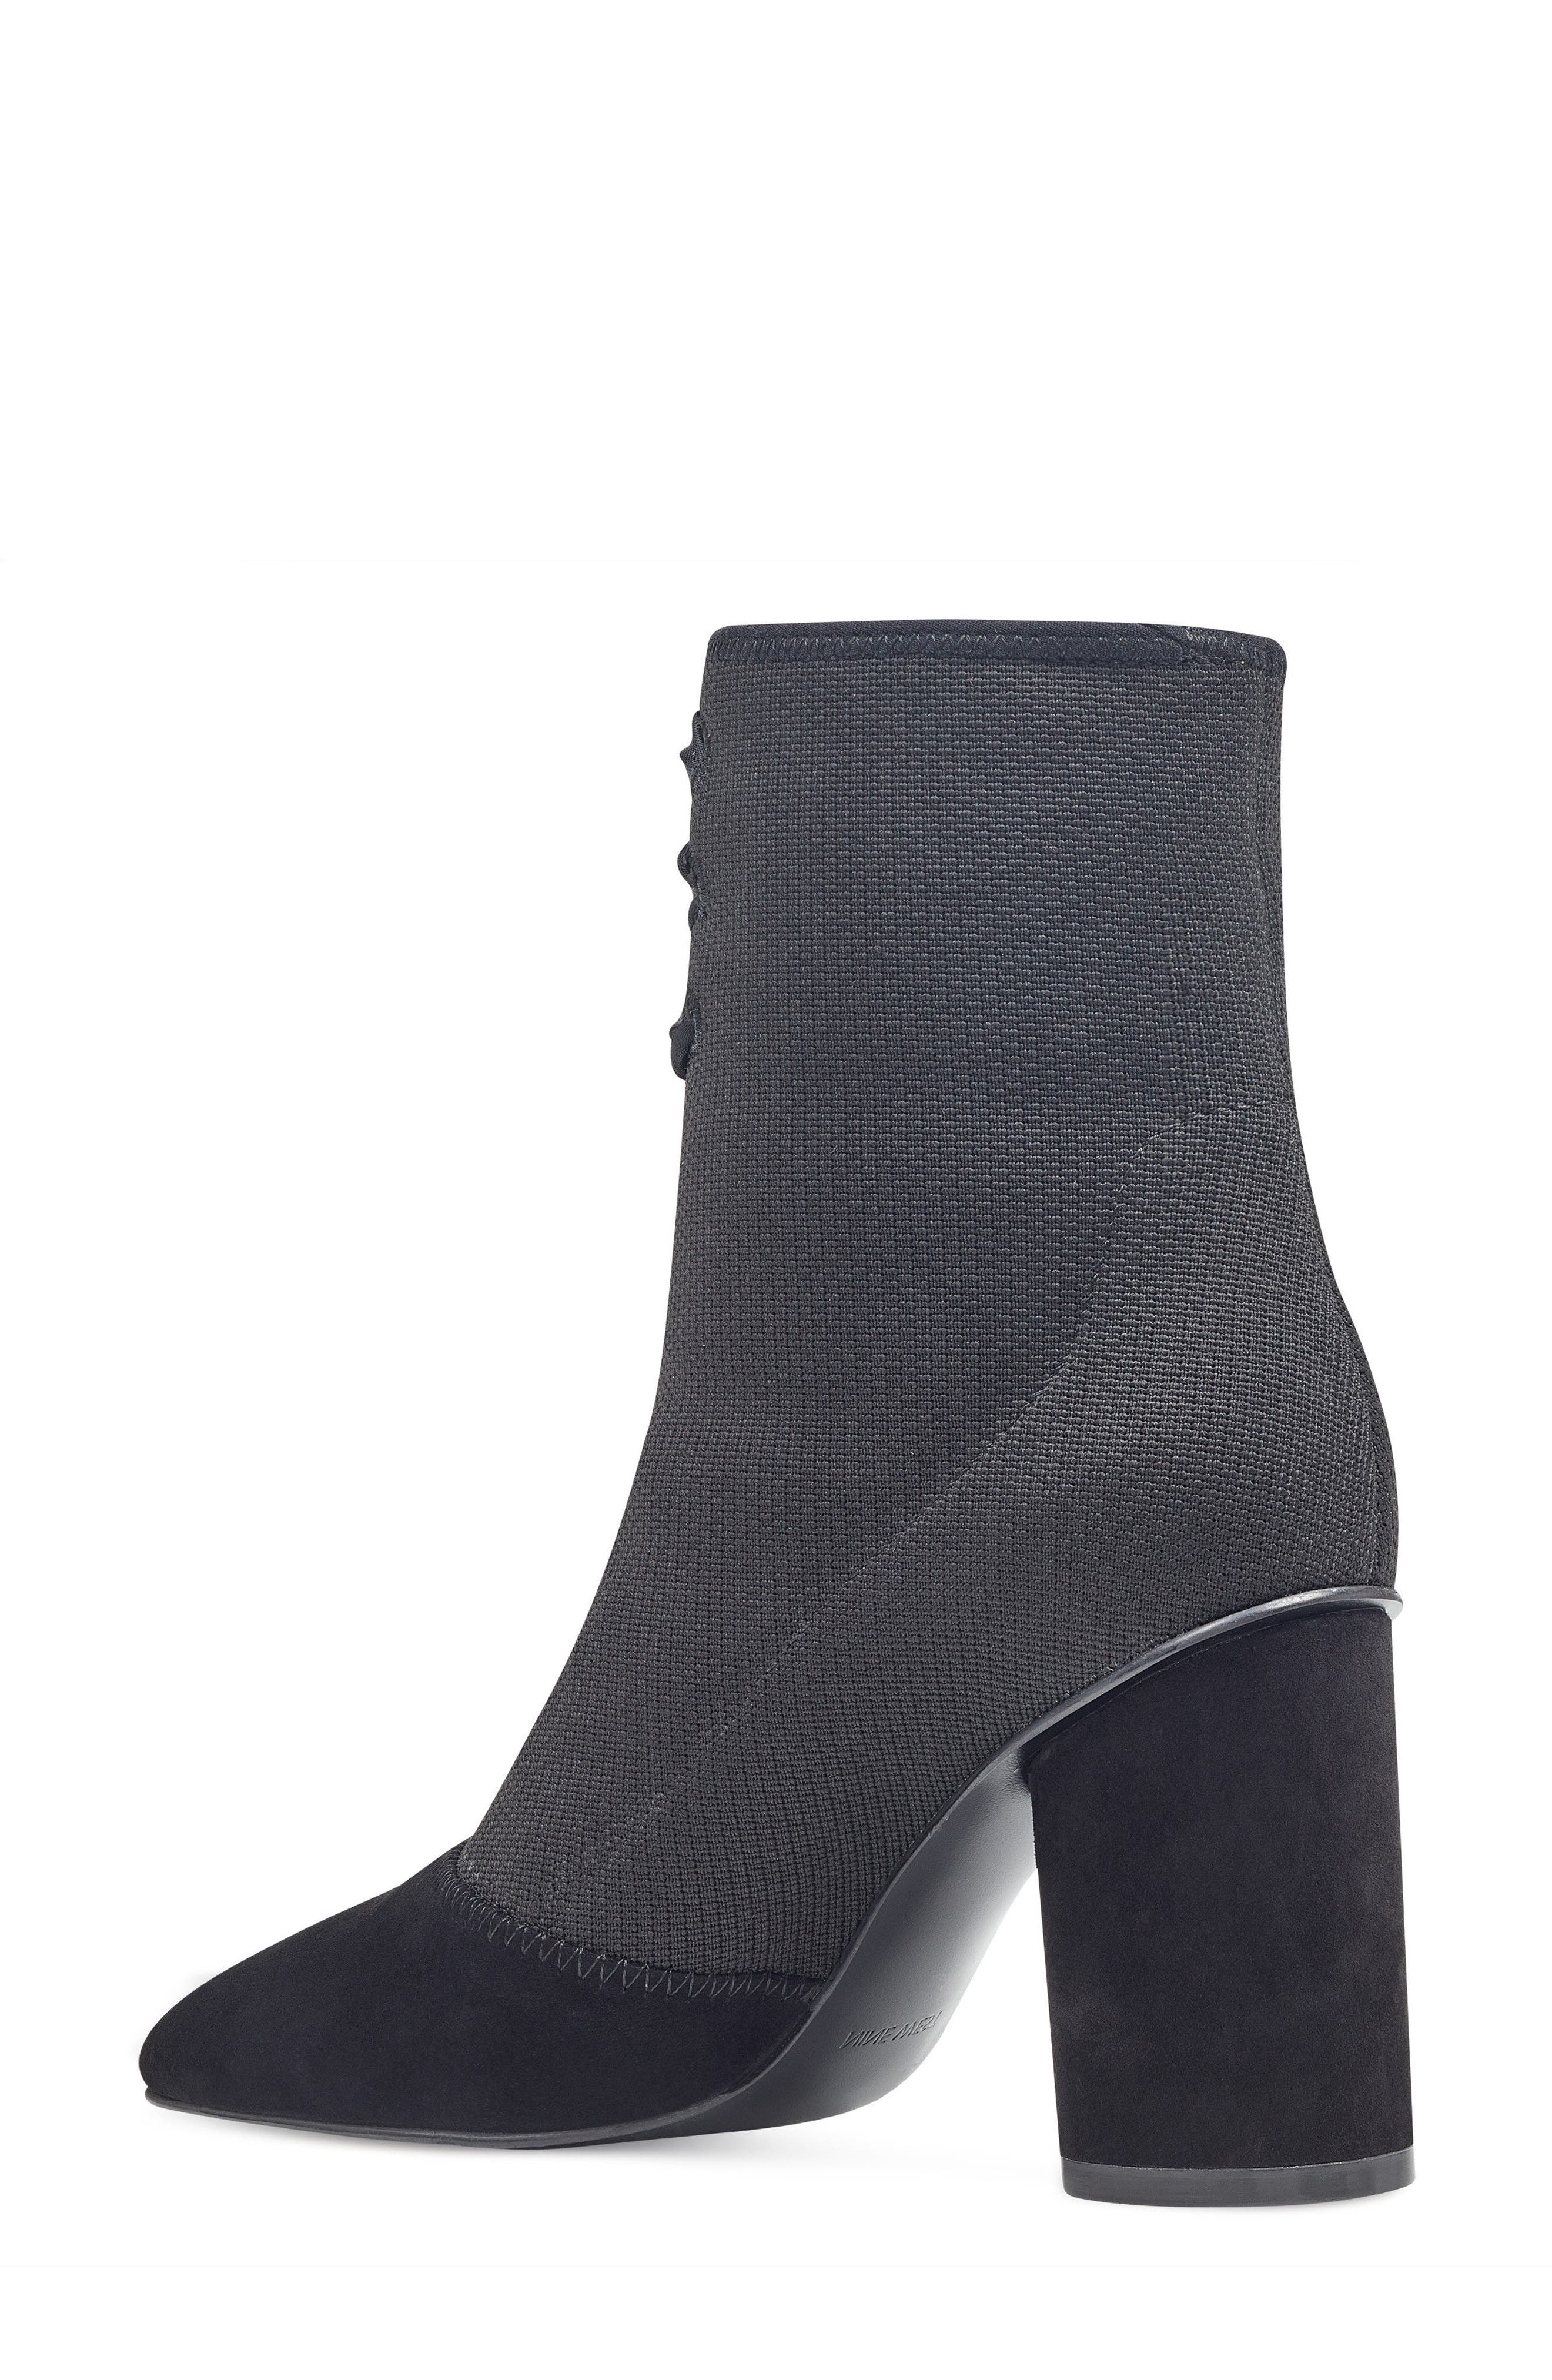 Carolina Pointy Toe Bootie,                             Alternate thumbnail 2, color,                             Black Multi Fabric